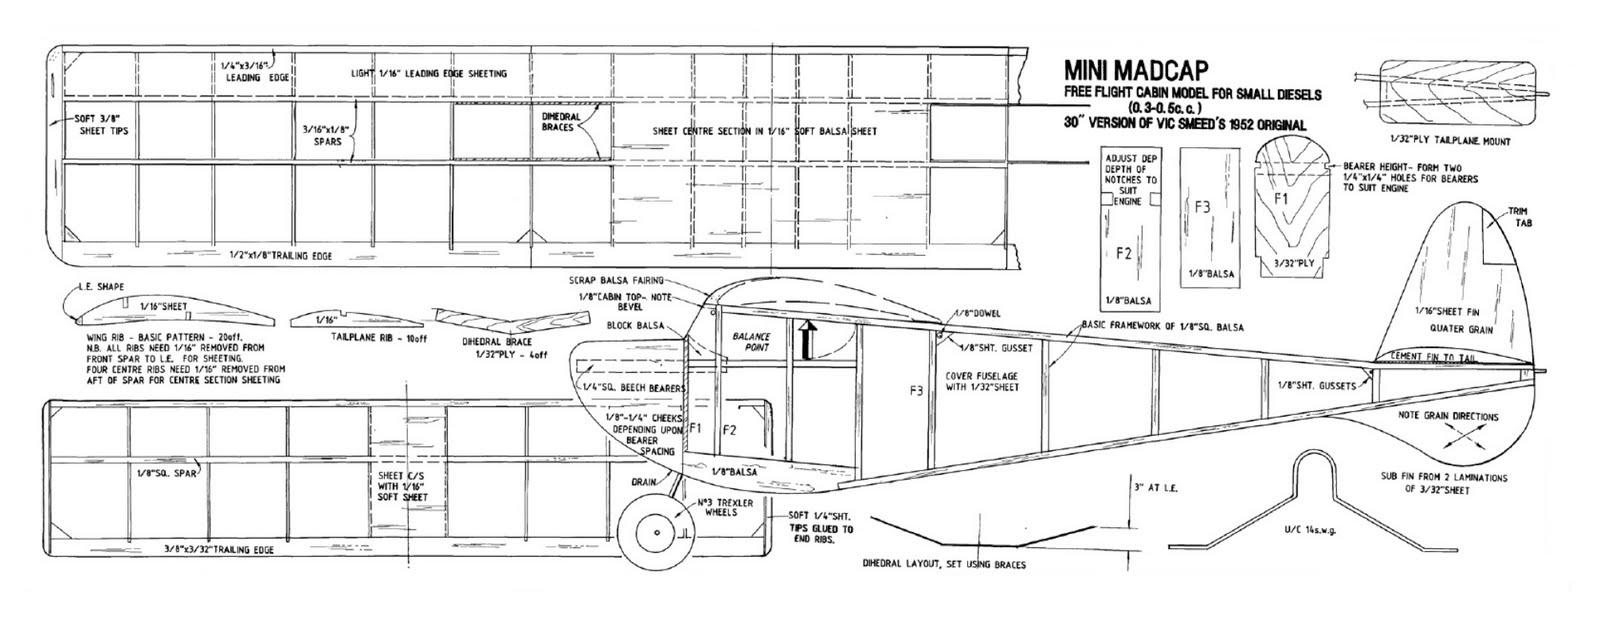 Volar Libremente - Free Flight Models Airplanes: MINI